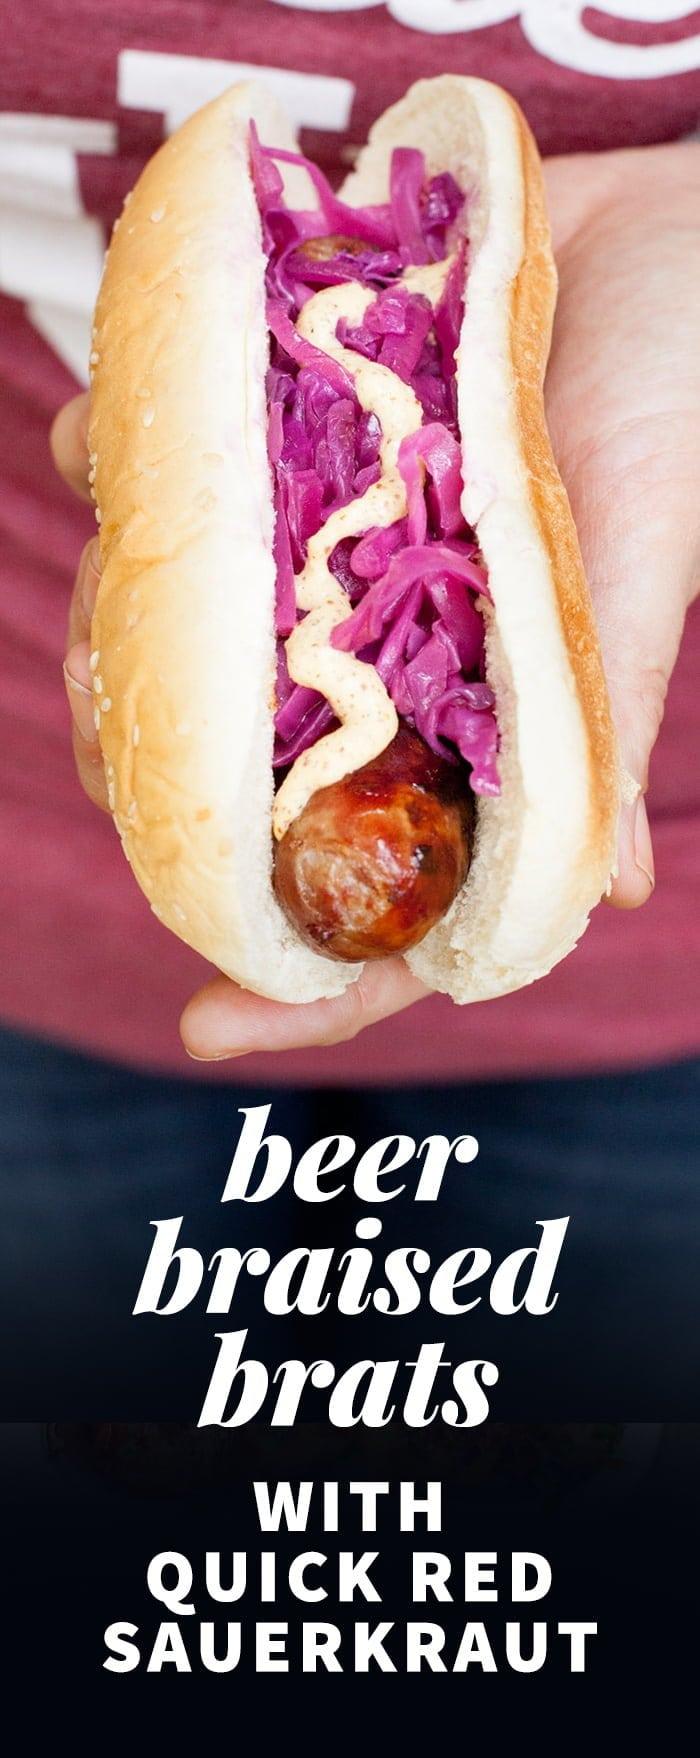 Beer Braised Brats with Quick Red Sauerkraut